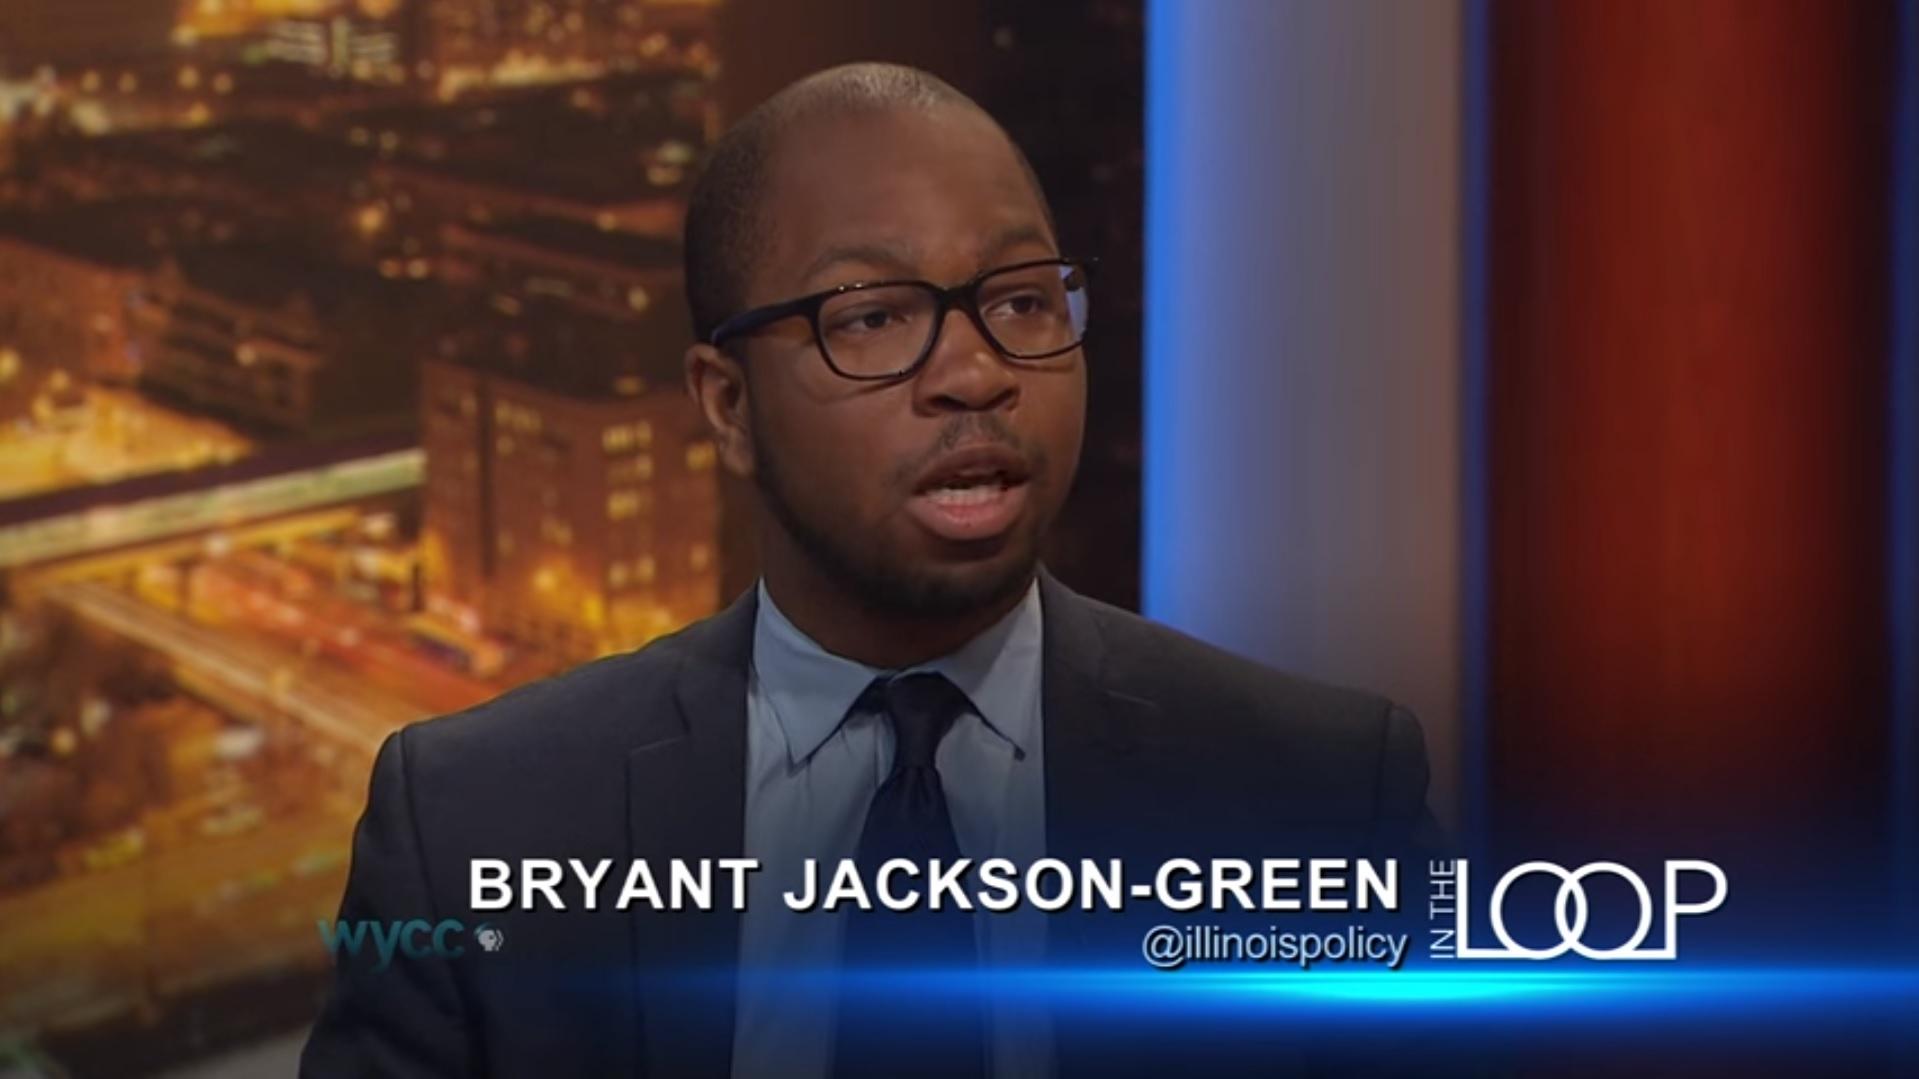 Bryant Jackson-Green PBS